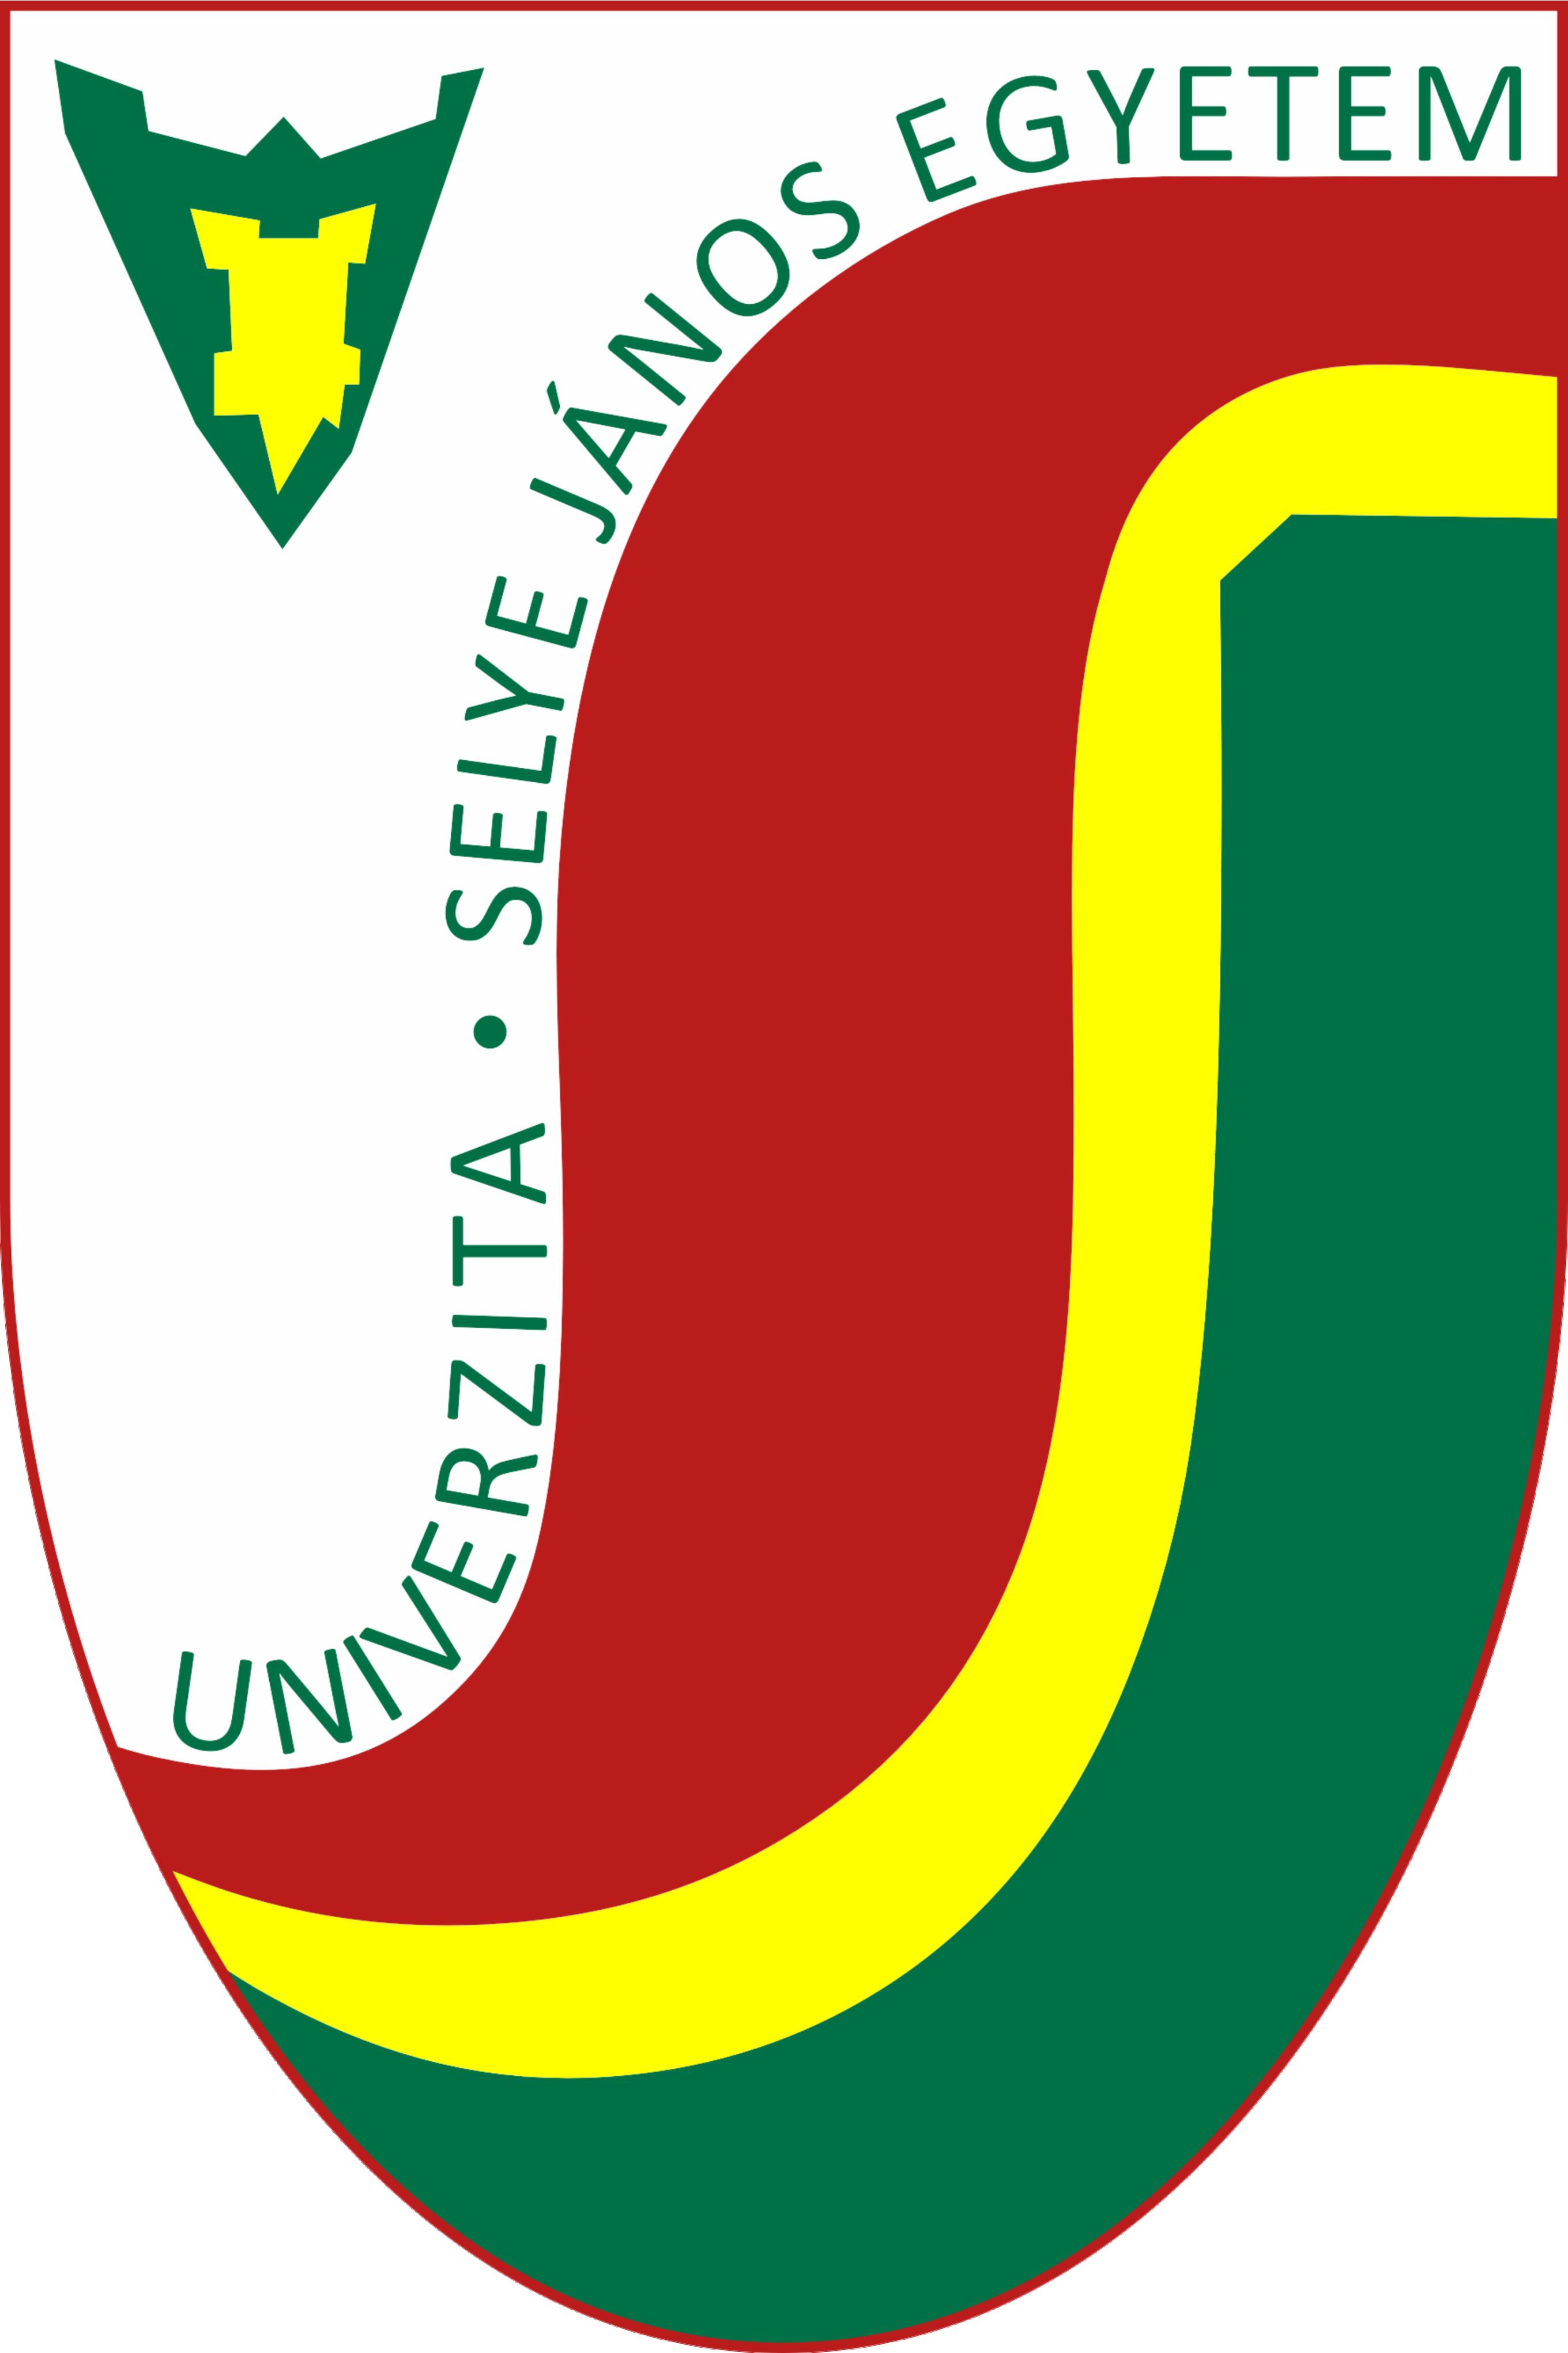 UNIVERZITA J. SELYEHO